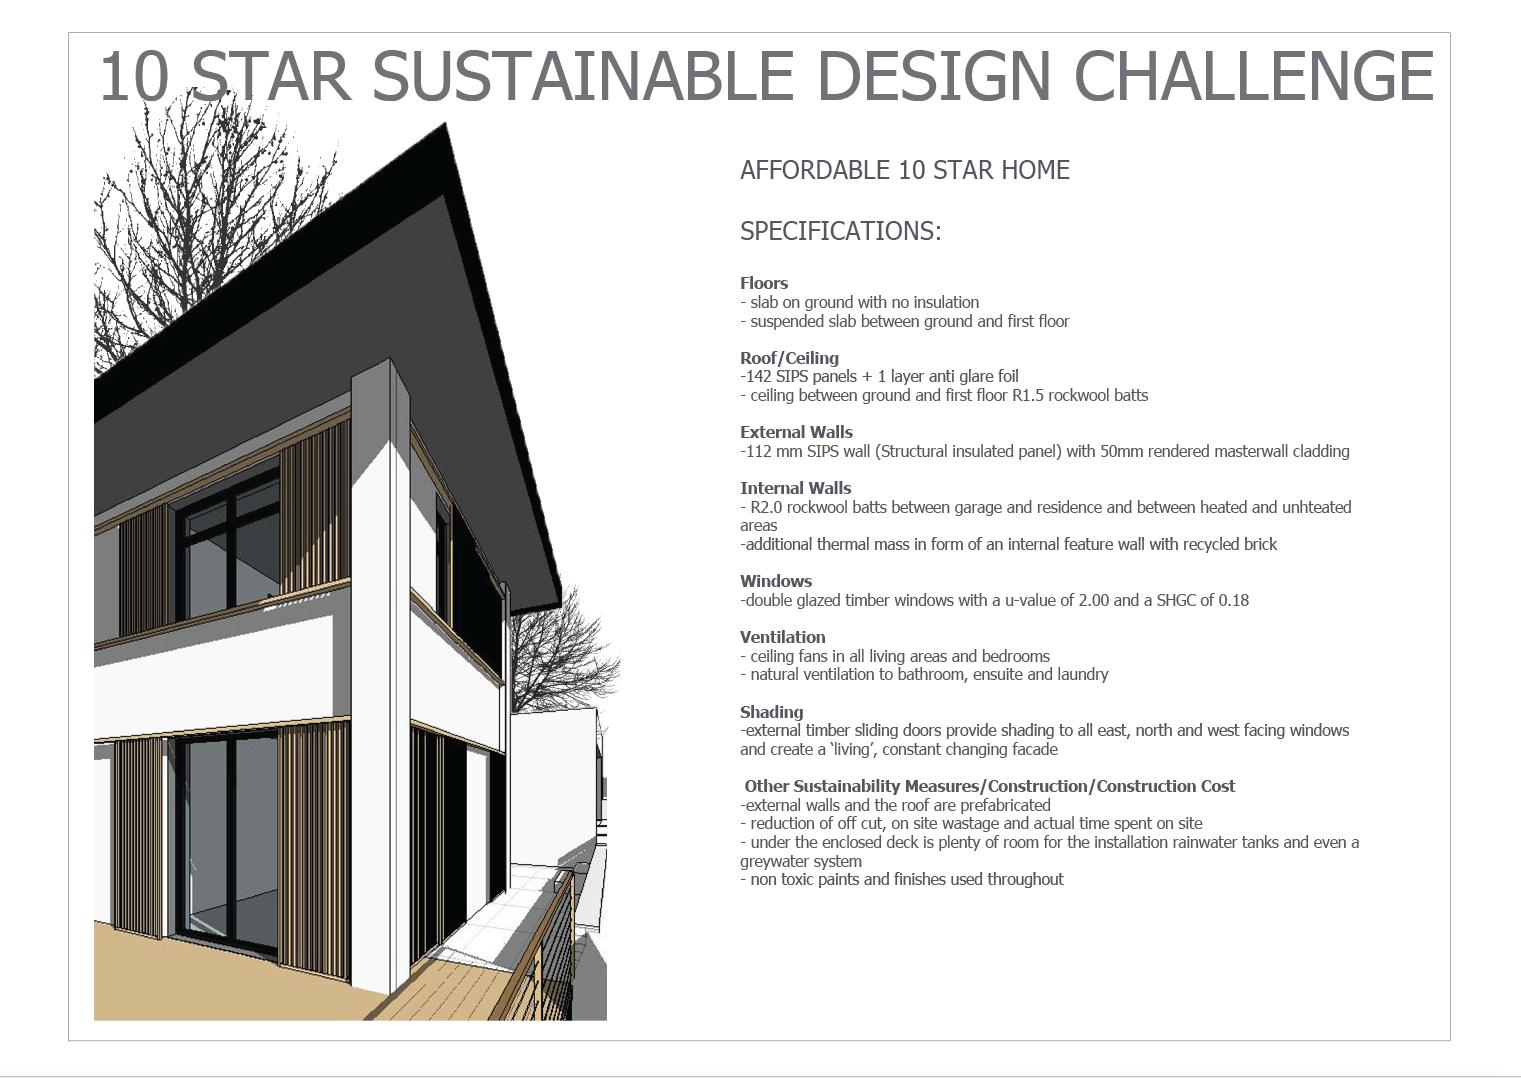 BDAV Best 10 Star Sustainable Design Challenge Entry 2015